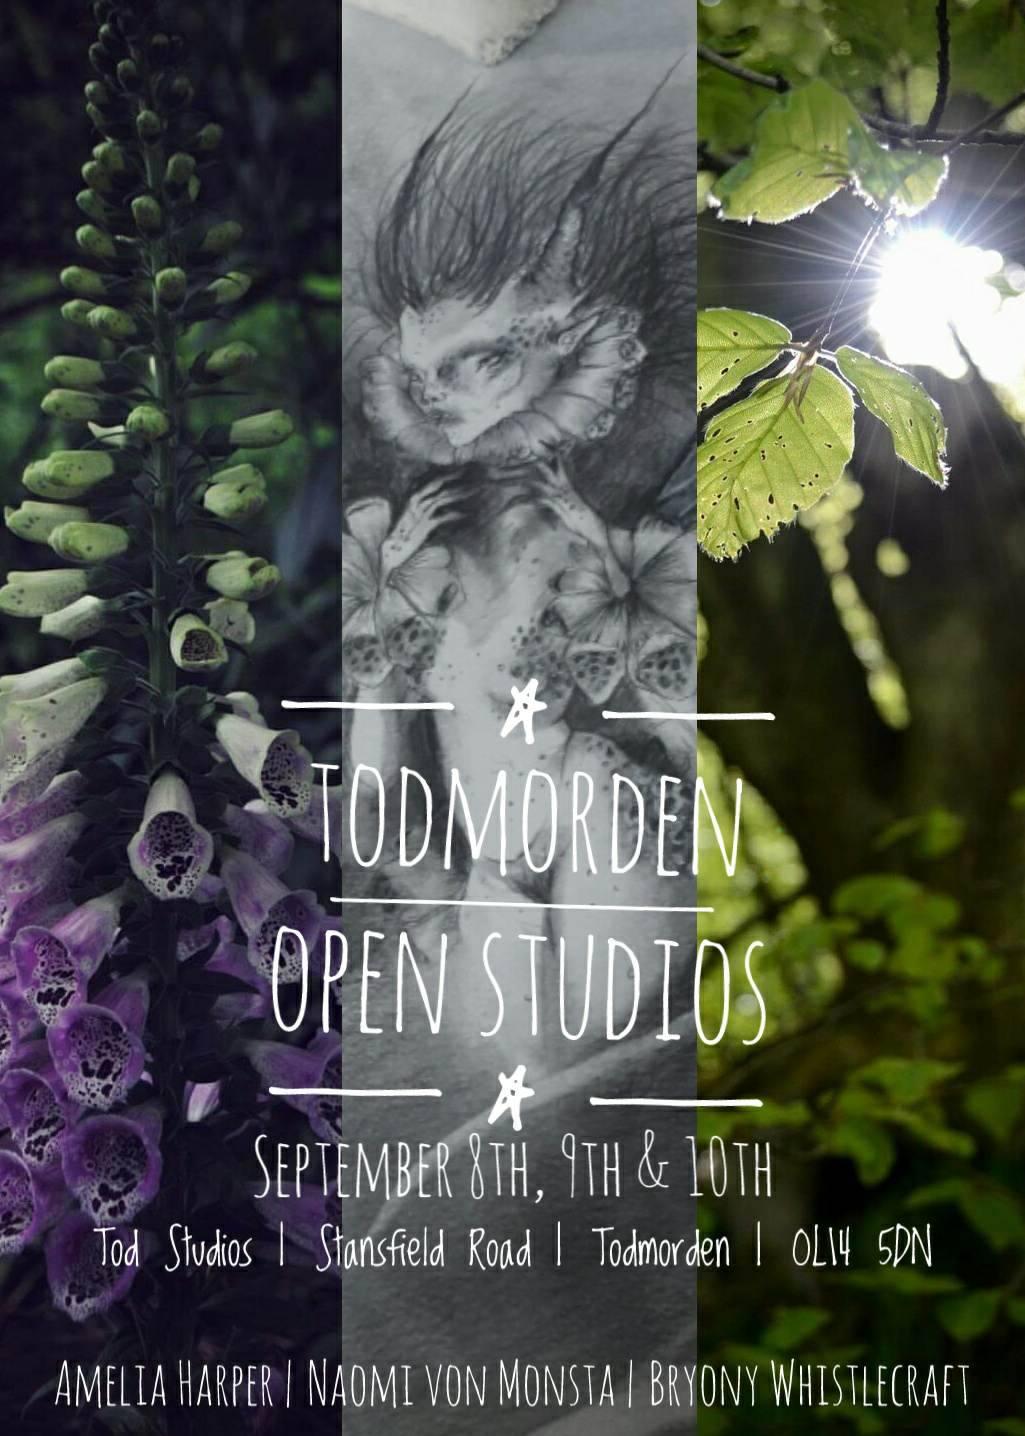 People of the Hills at Todmorden Open Studios 2017   Amelia Harper - Naomi von Monsta - Bryony Whistlecraft